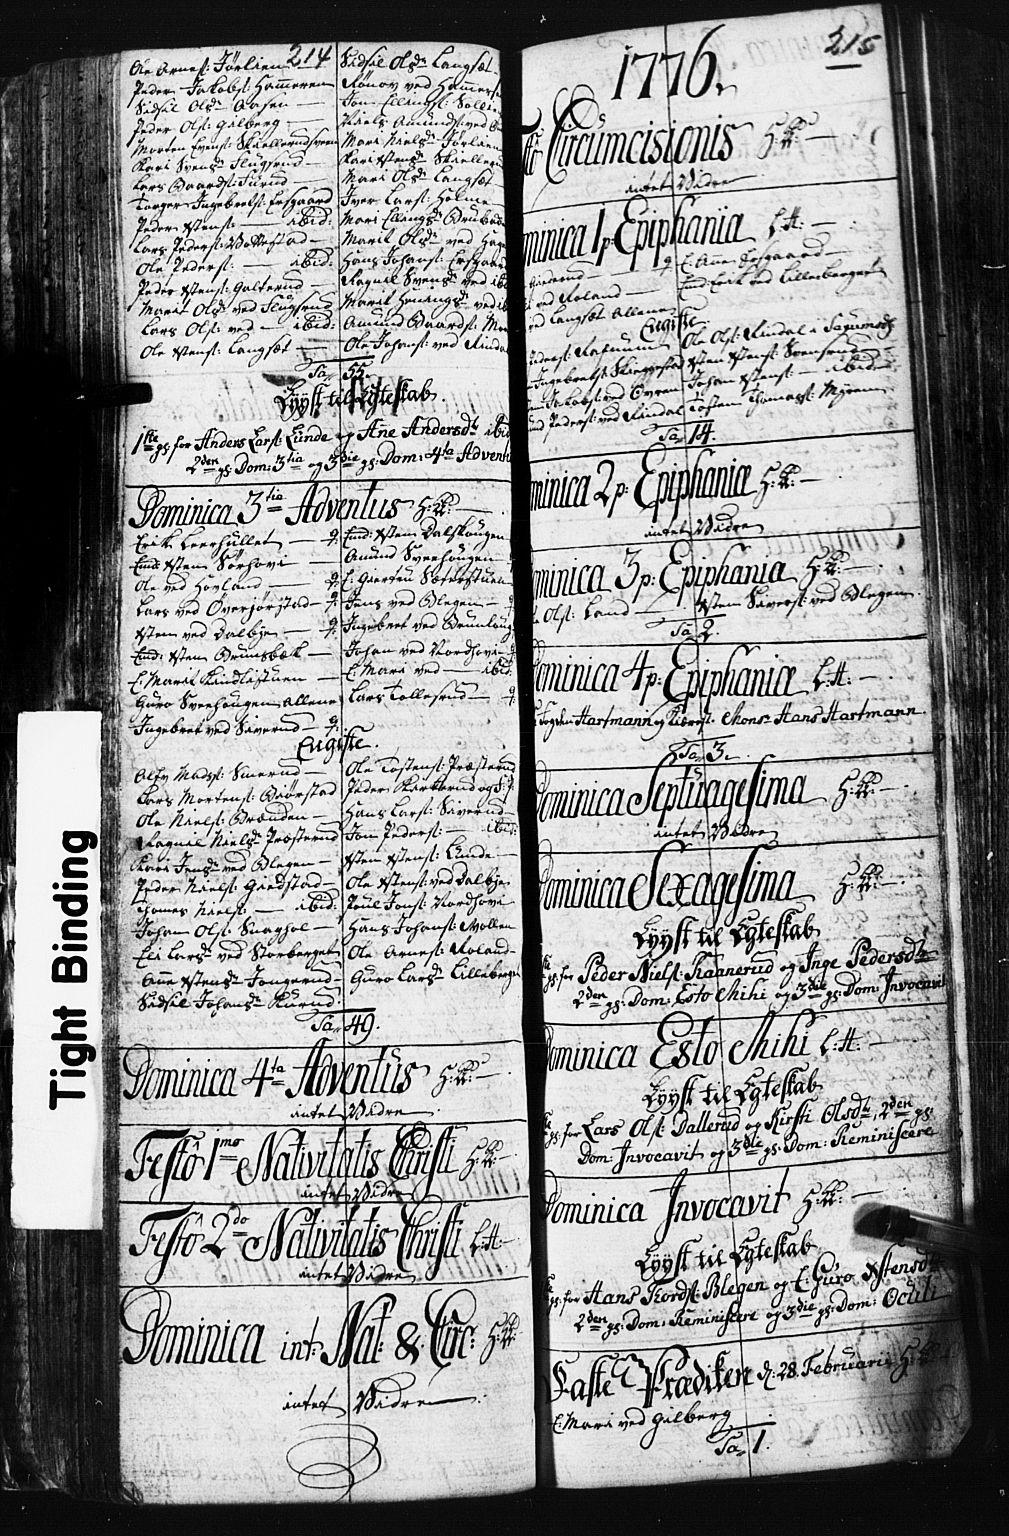 SAH, Fåberg prestekontor, Klokkerbok nr. 3, 1768-1796, s. 214-215